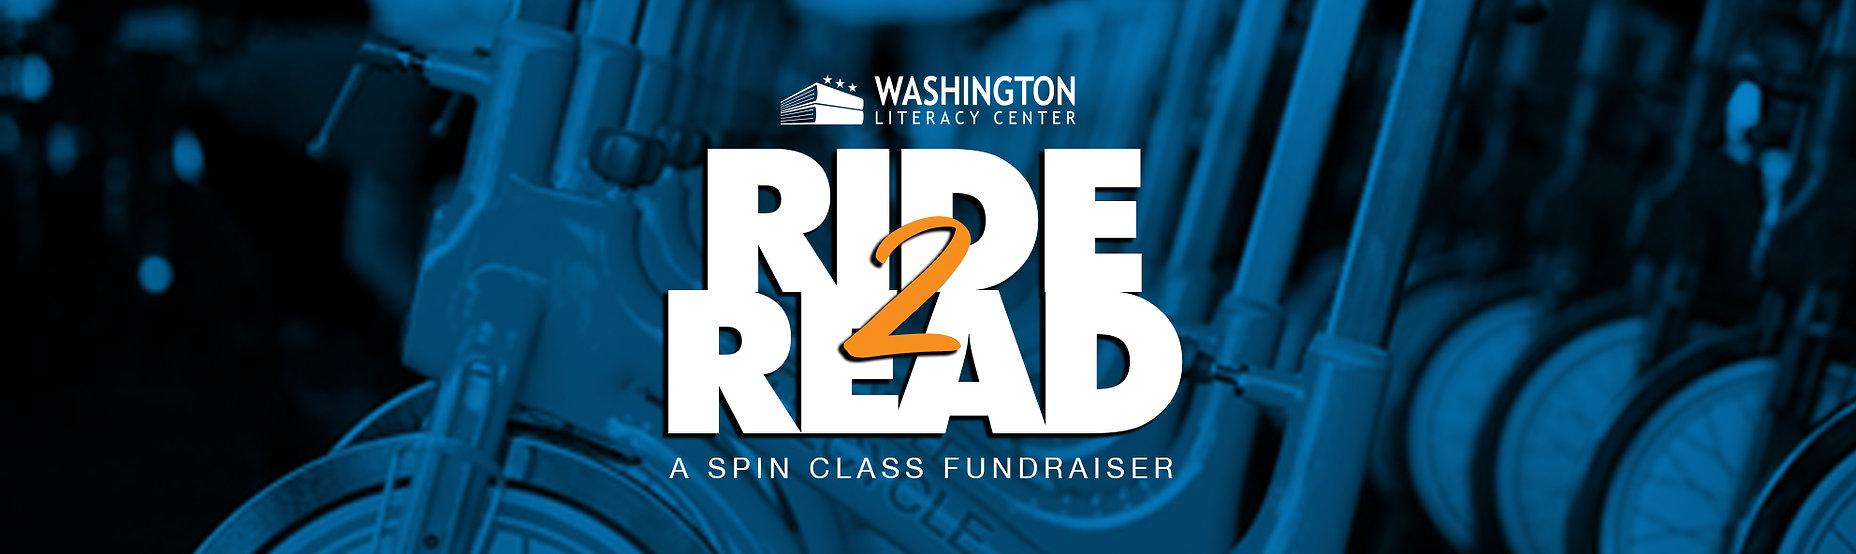 Ride 2 Read Page Header.jpg